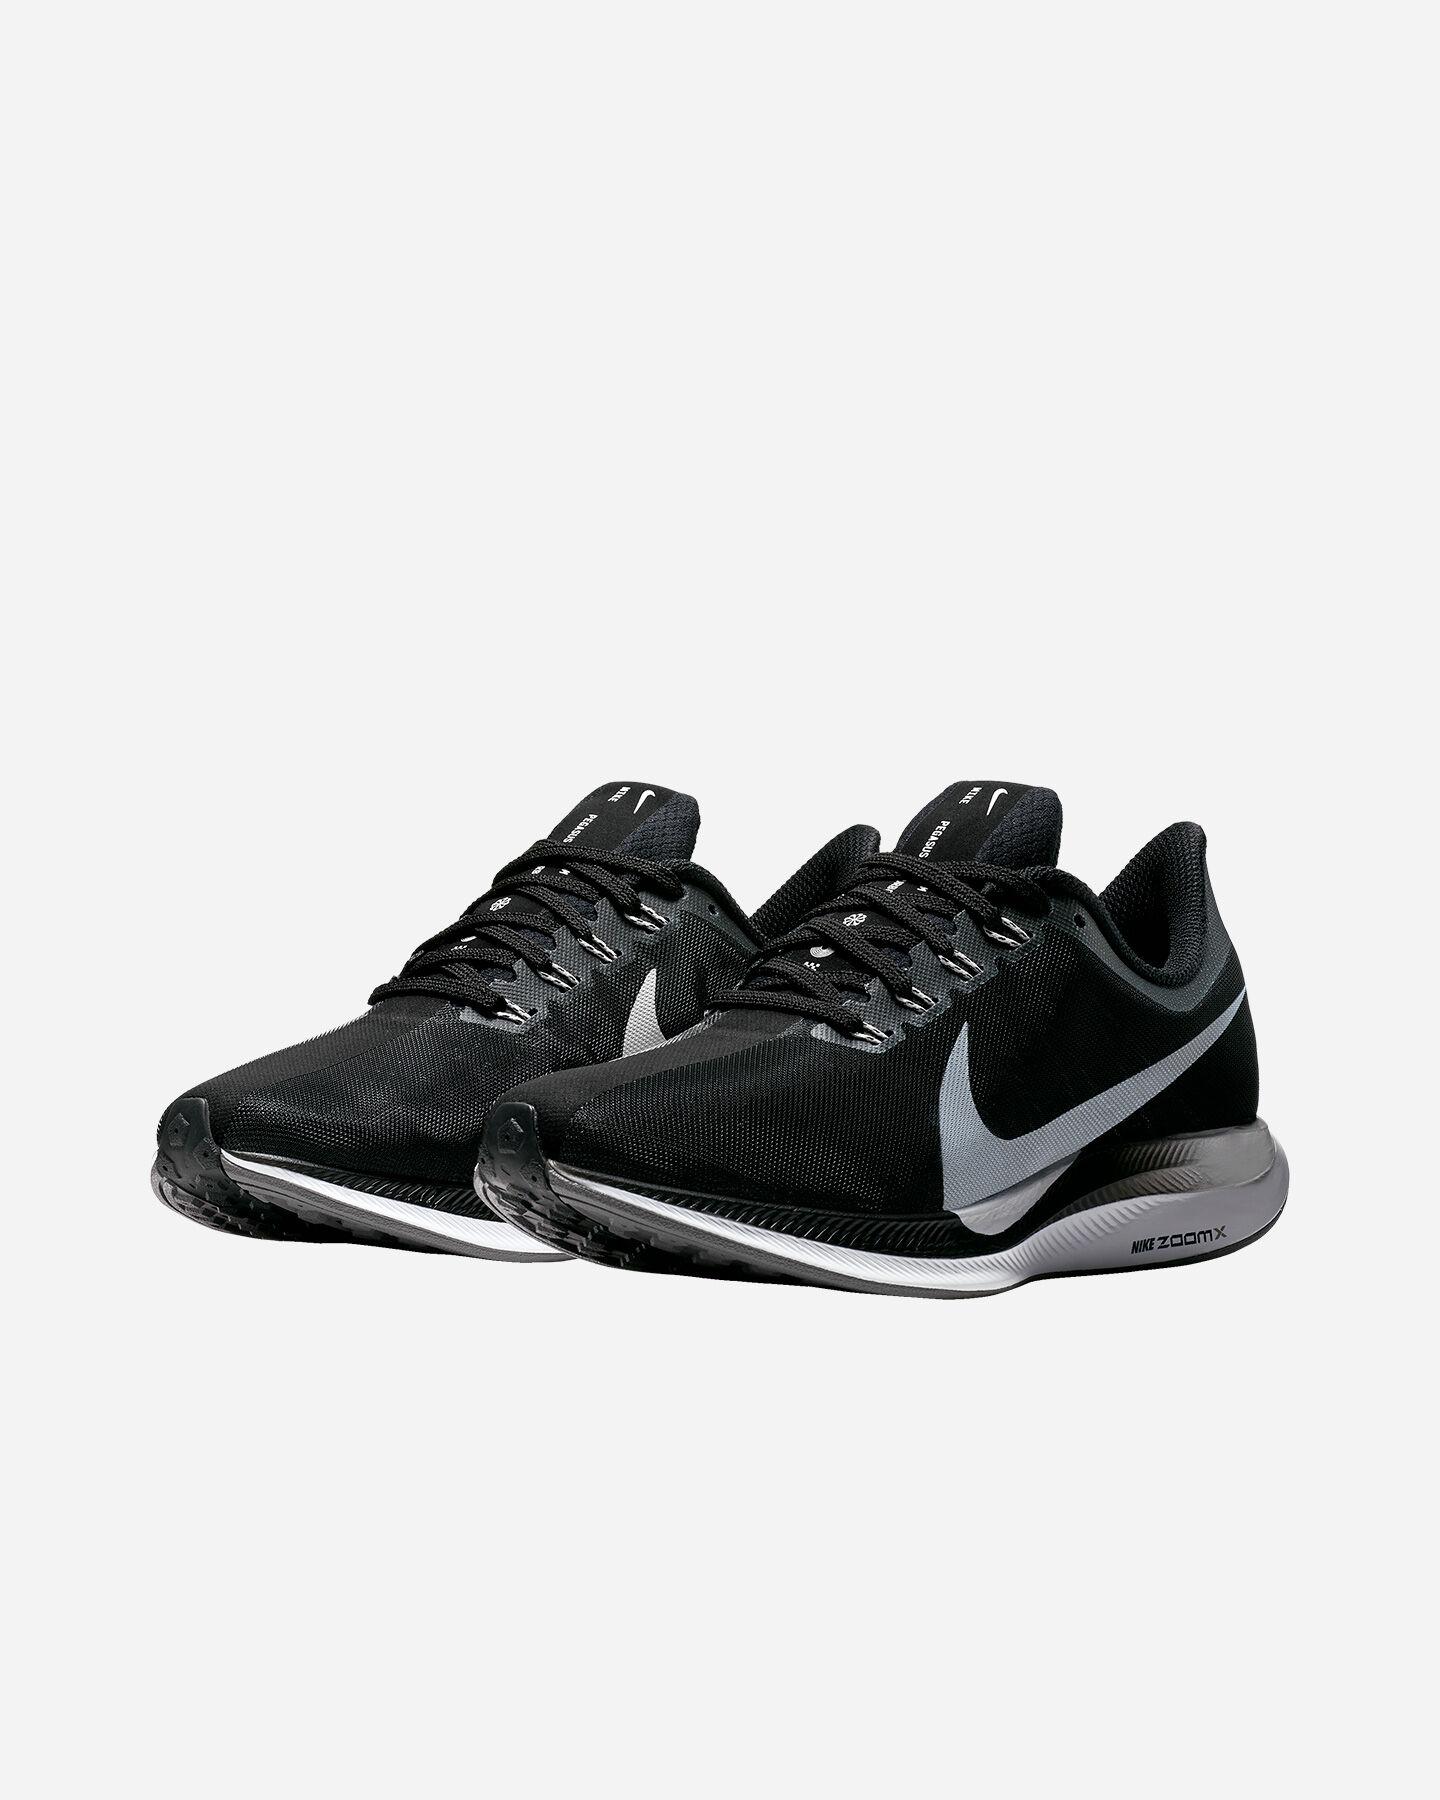 Zoom Cisalfa Aj4115 W Scarpe 35 Nike Turbo Su Pcaqw 001 Running Pegasus  qgnTYwntC1 89c4ac6976a